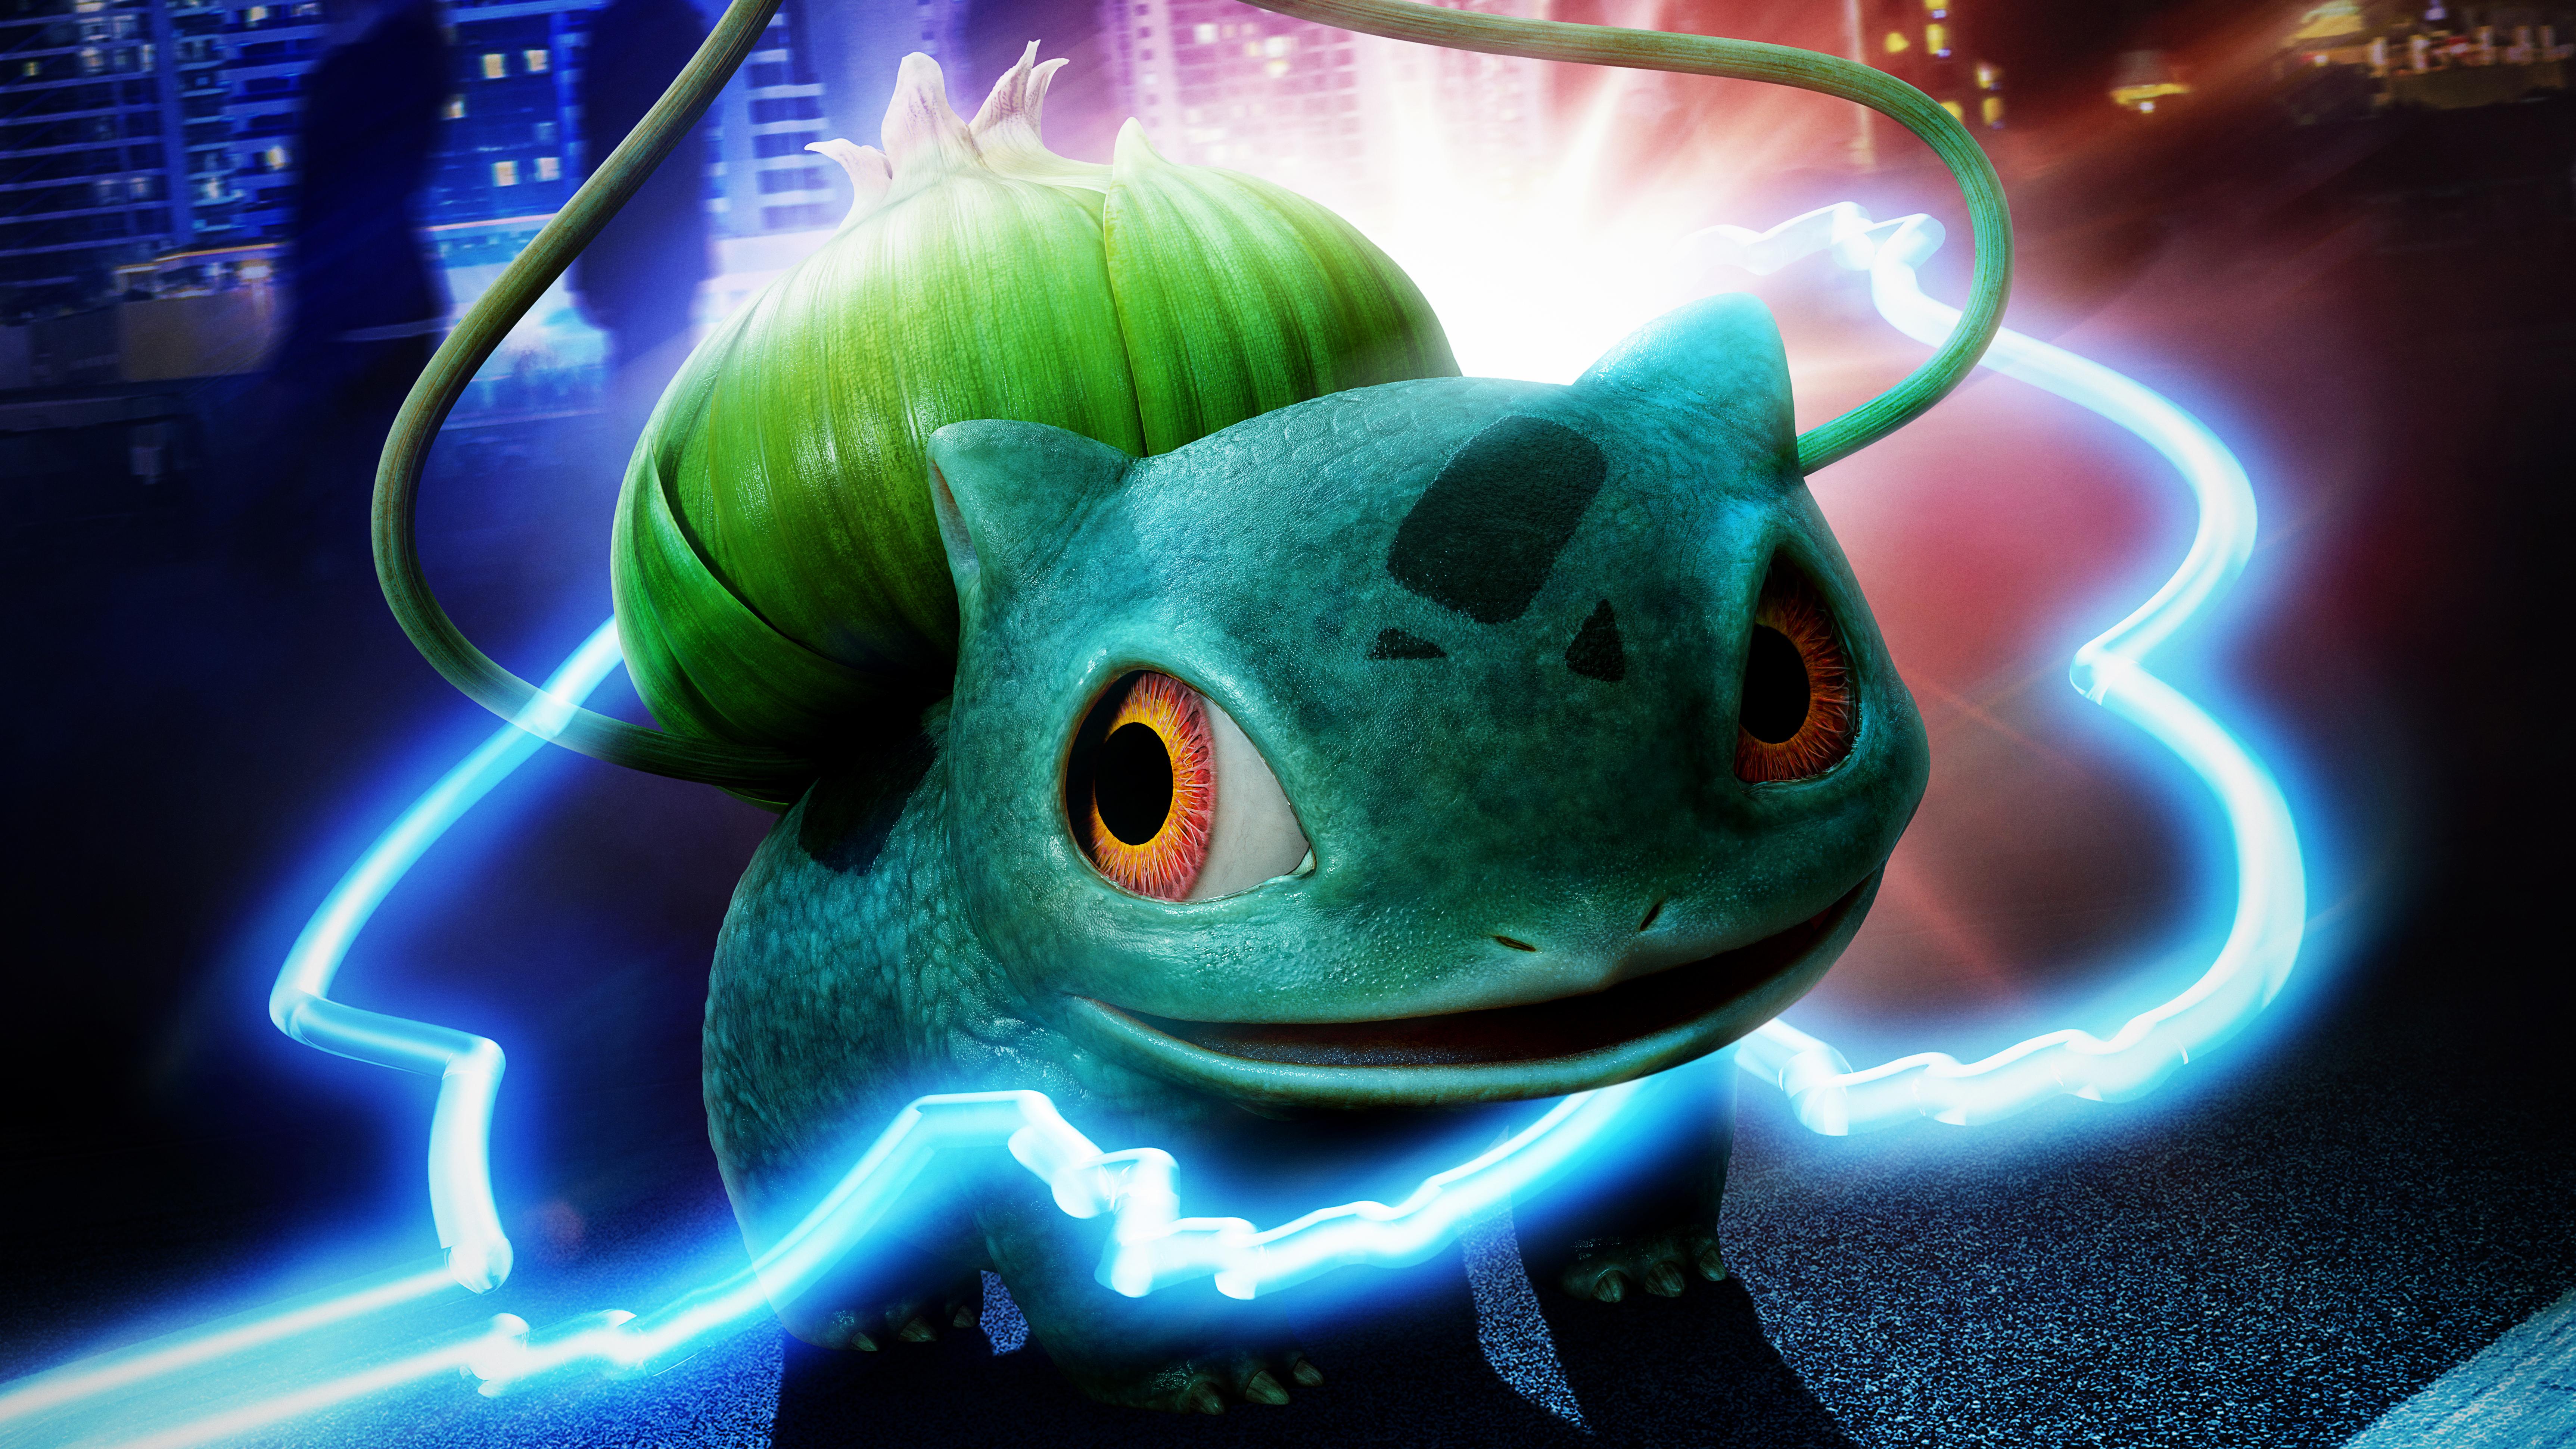 Detective Pikachu Bulbasaur 5k Hd Movies 4k Wallpapers